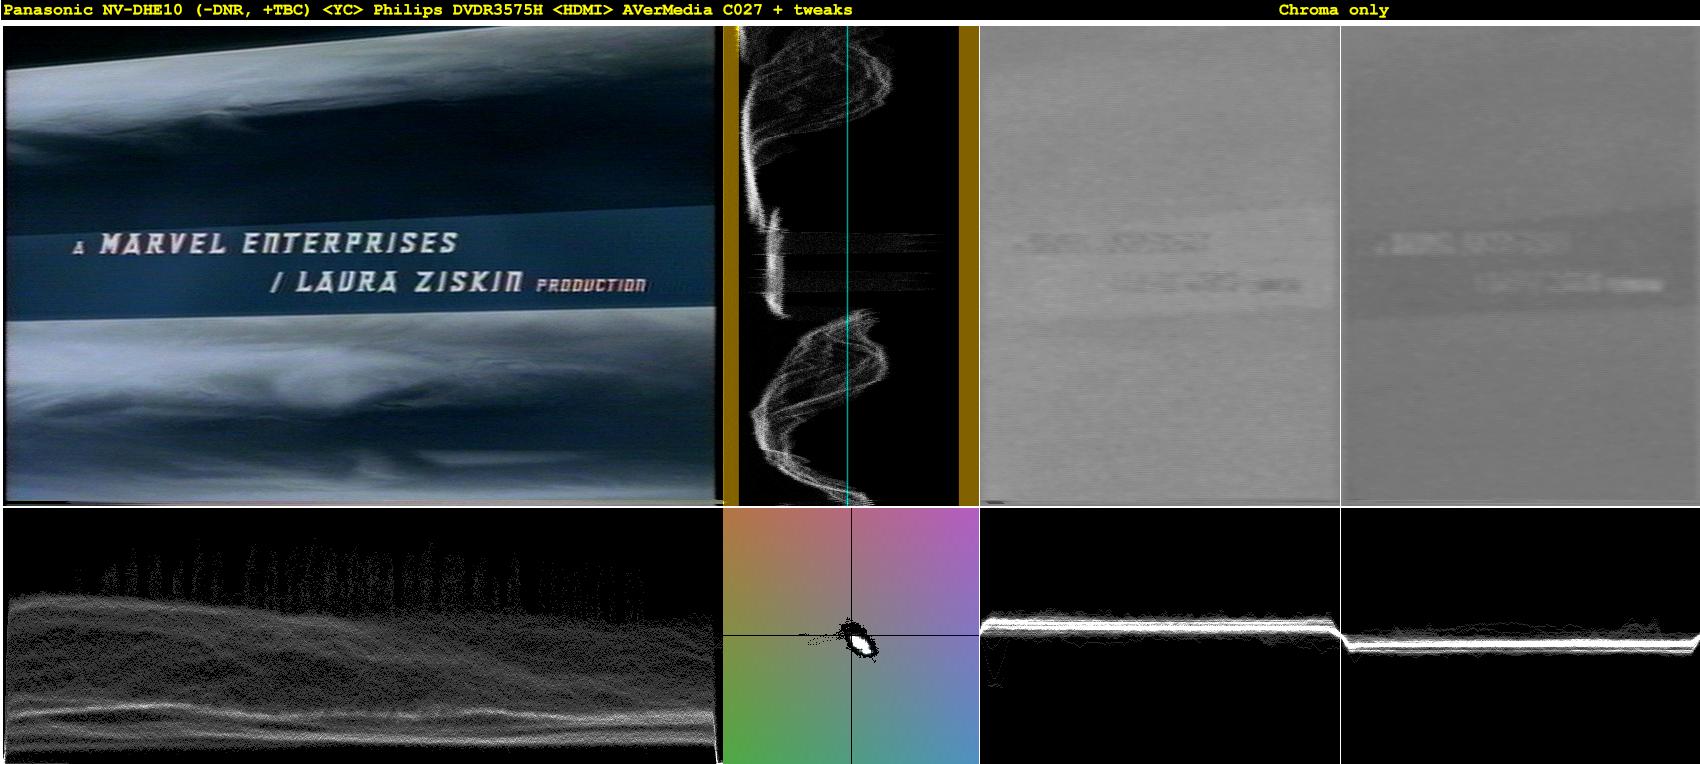 Click image for larger version  Name:0-09-01 - Panasonic NV-DHE10 (-DNR, +TBC).png Views:890 Size:947.2 KB ID:37992